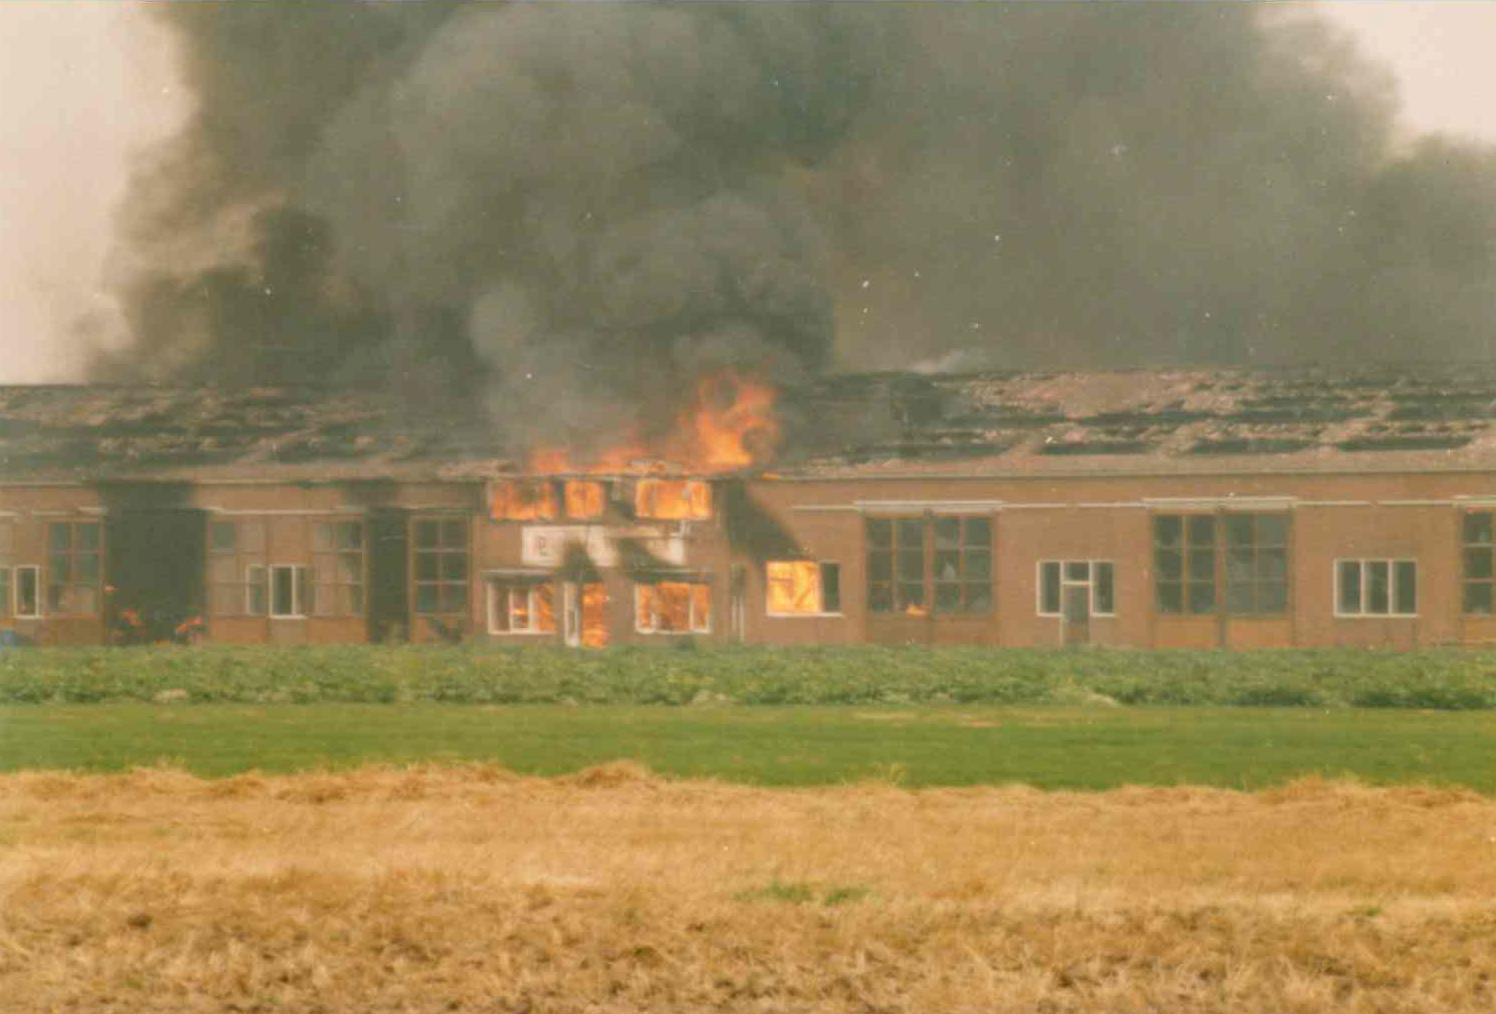 Verwoestende brand